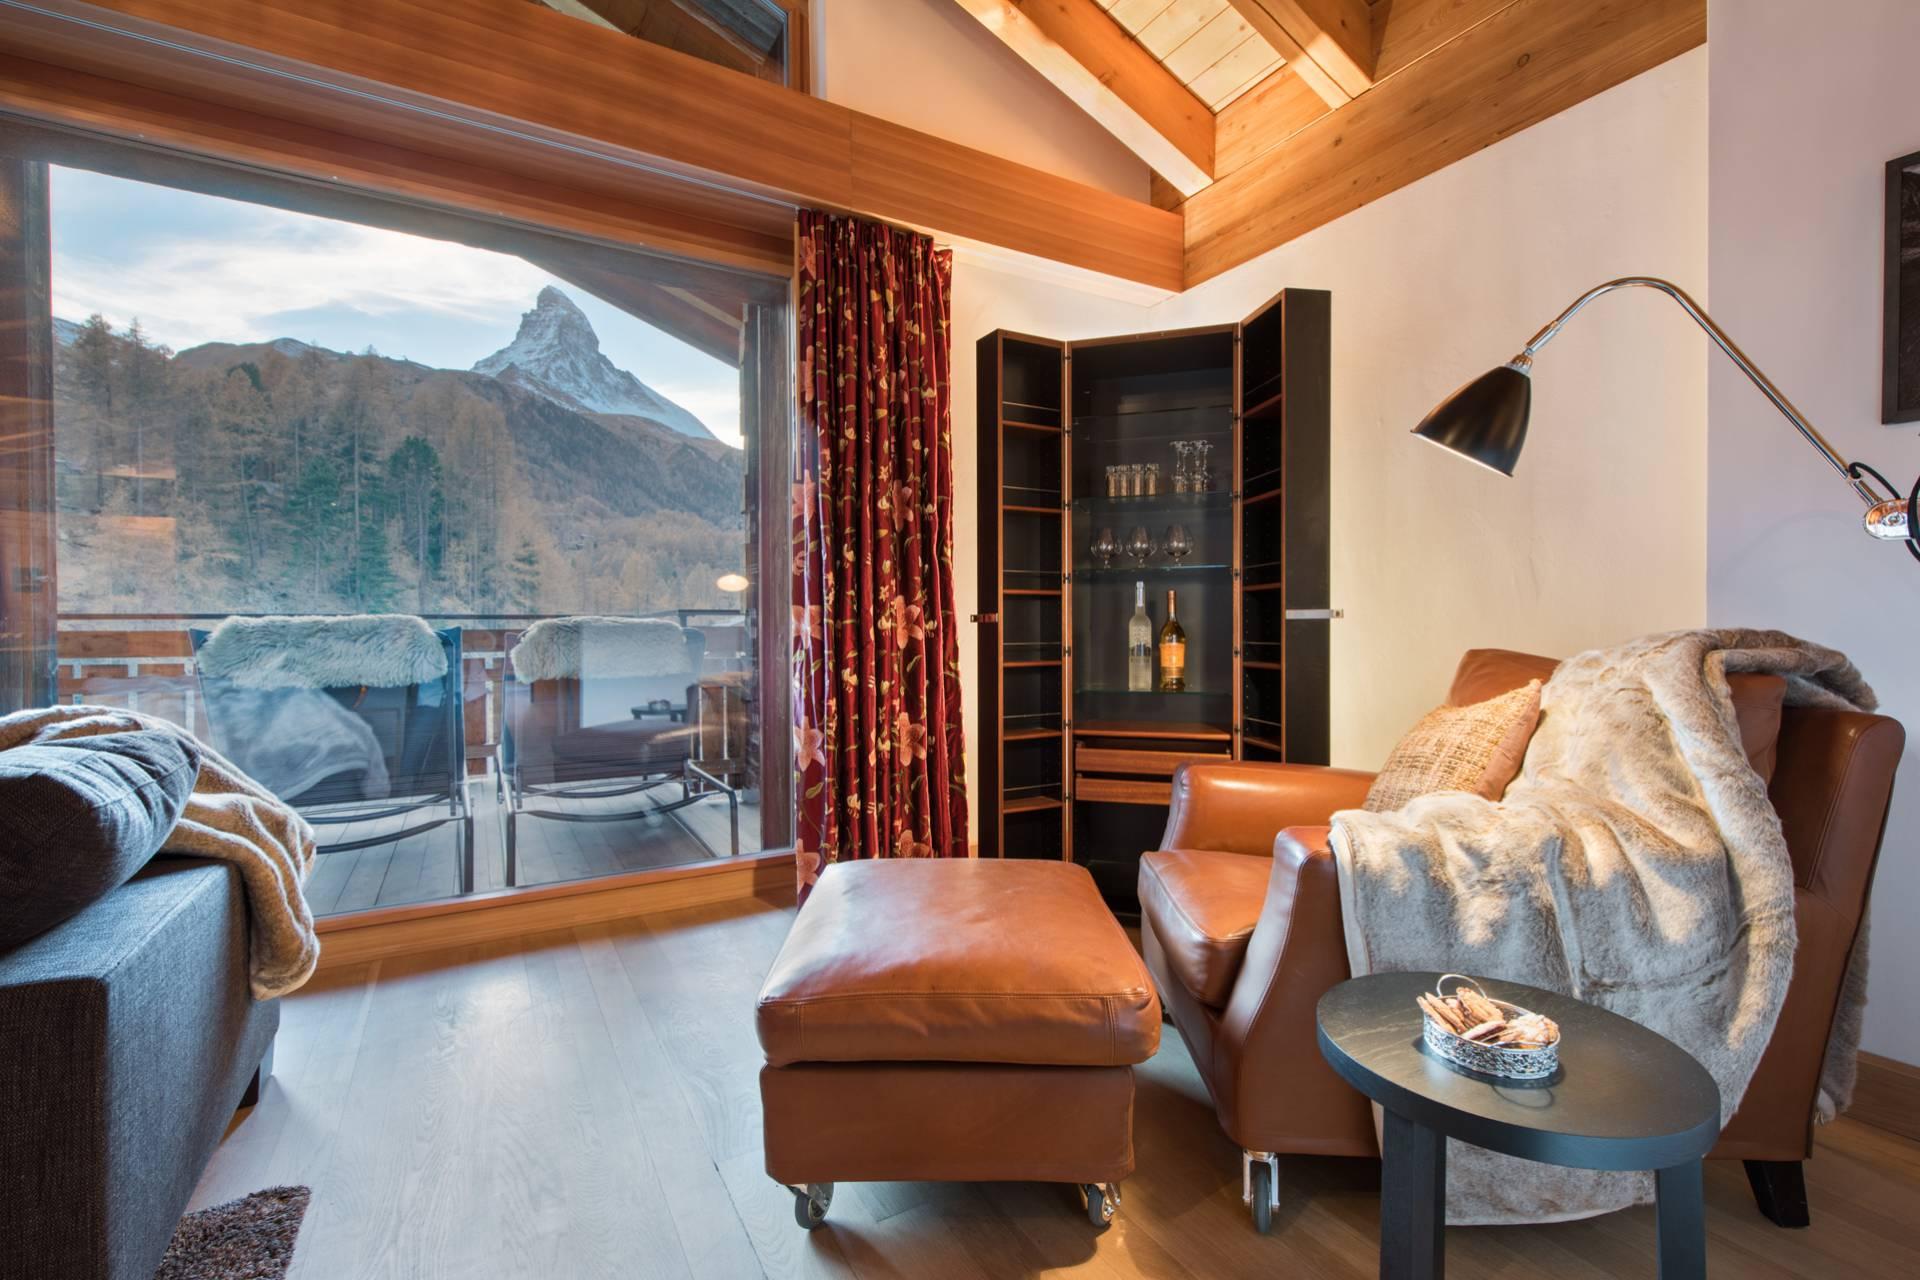 camargue location villa provence bord de mer avec piscine